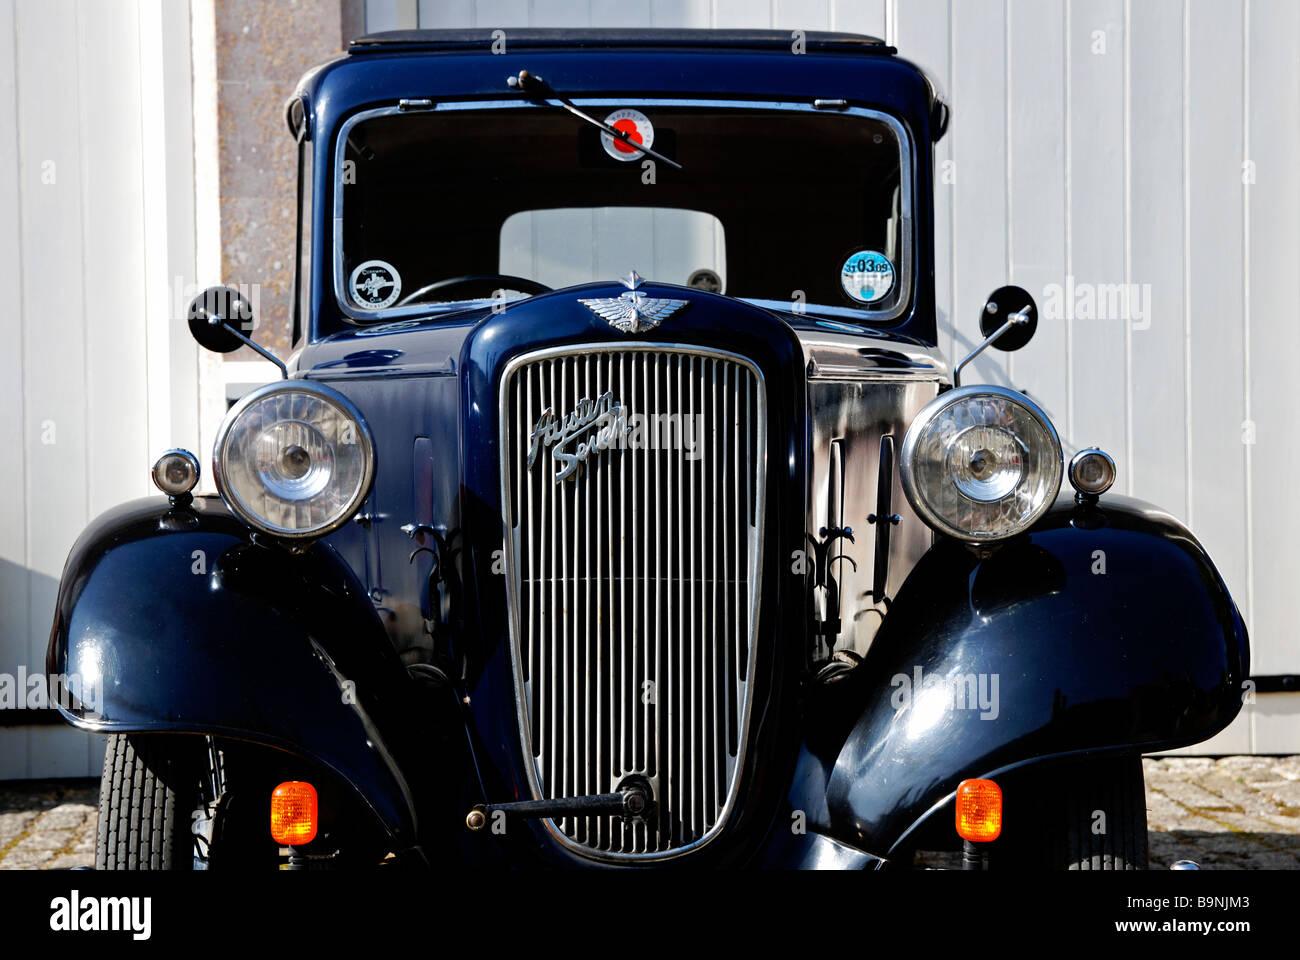 a vintage austin seven motor car - Stock Image